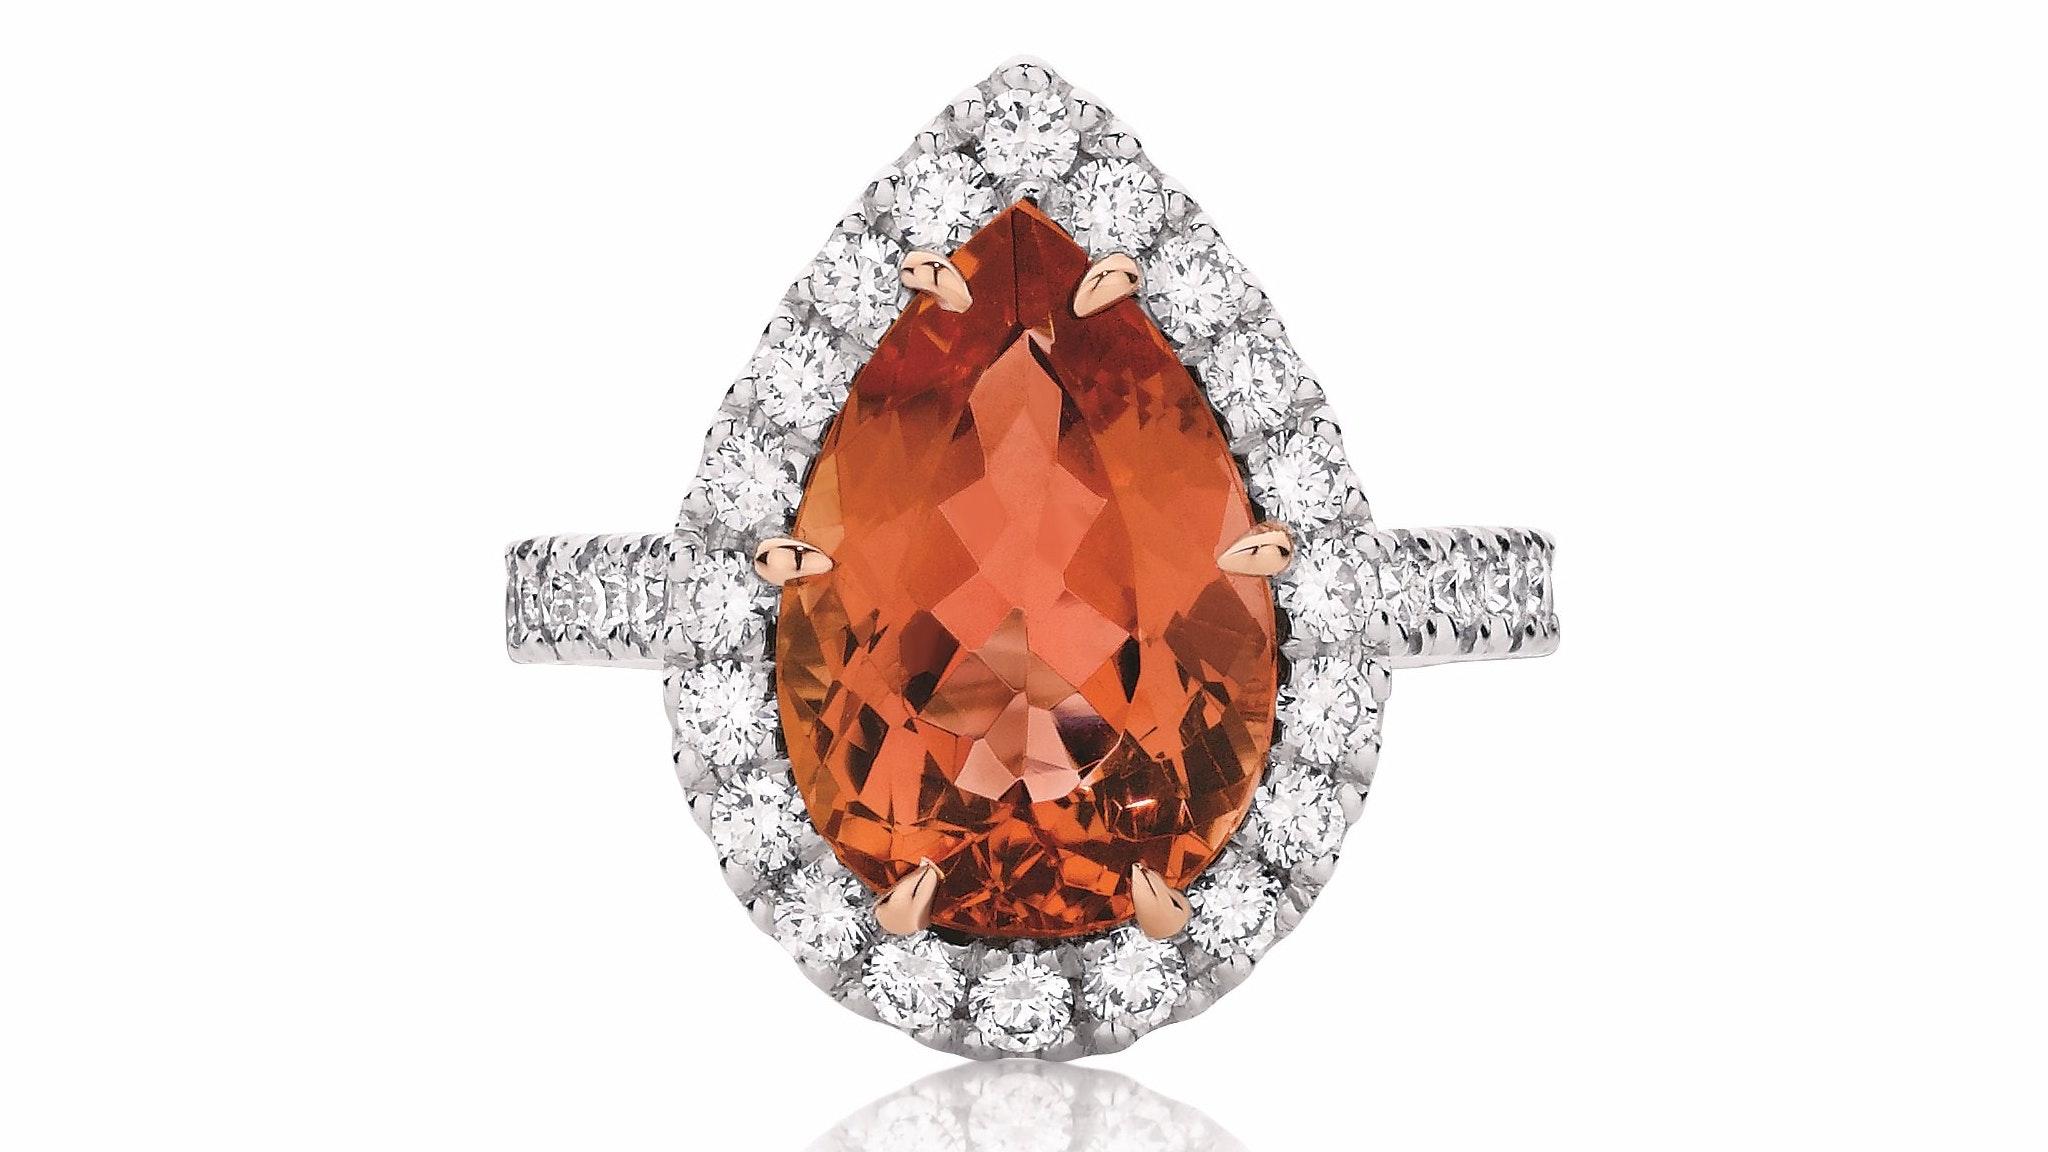 Pear cut halo dress ring